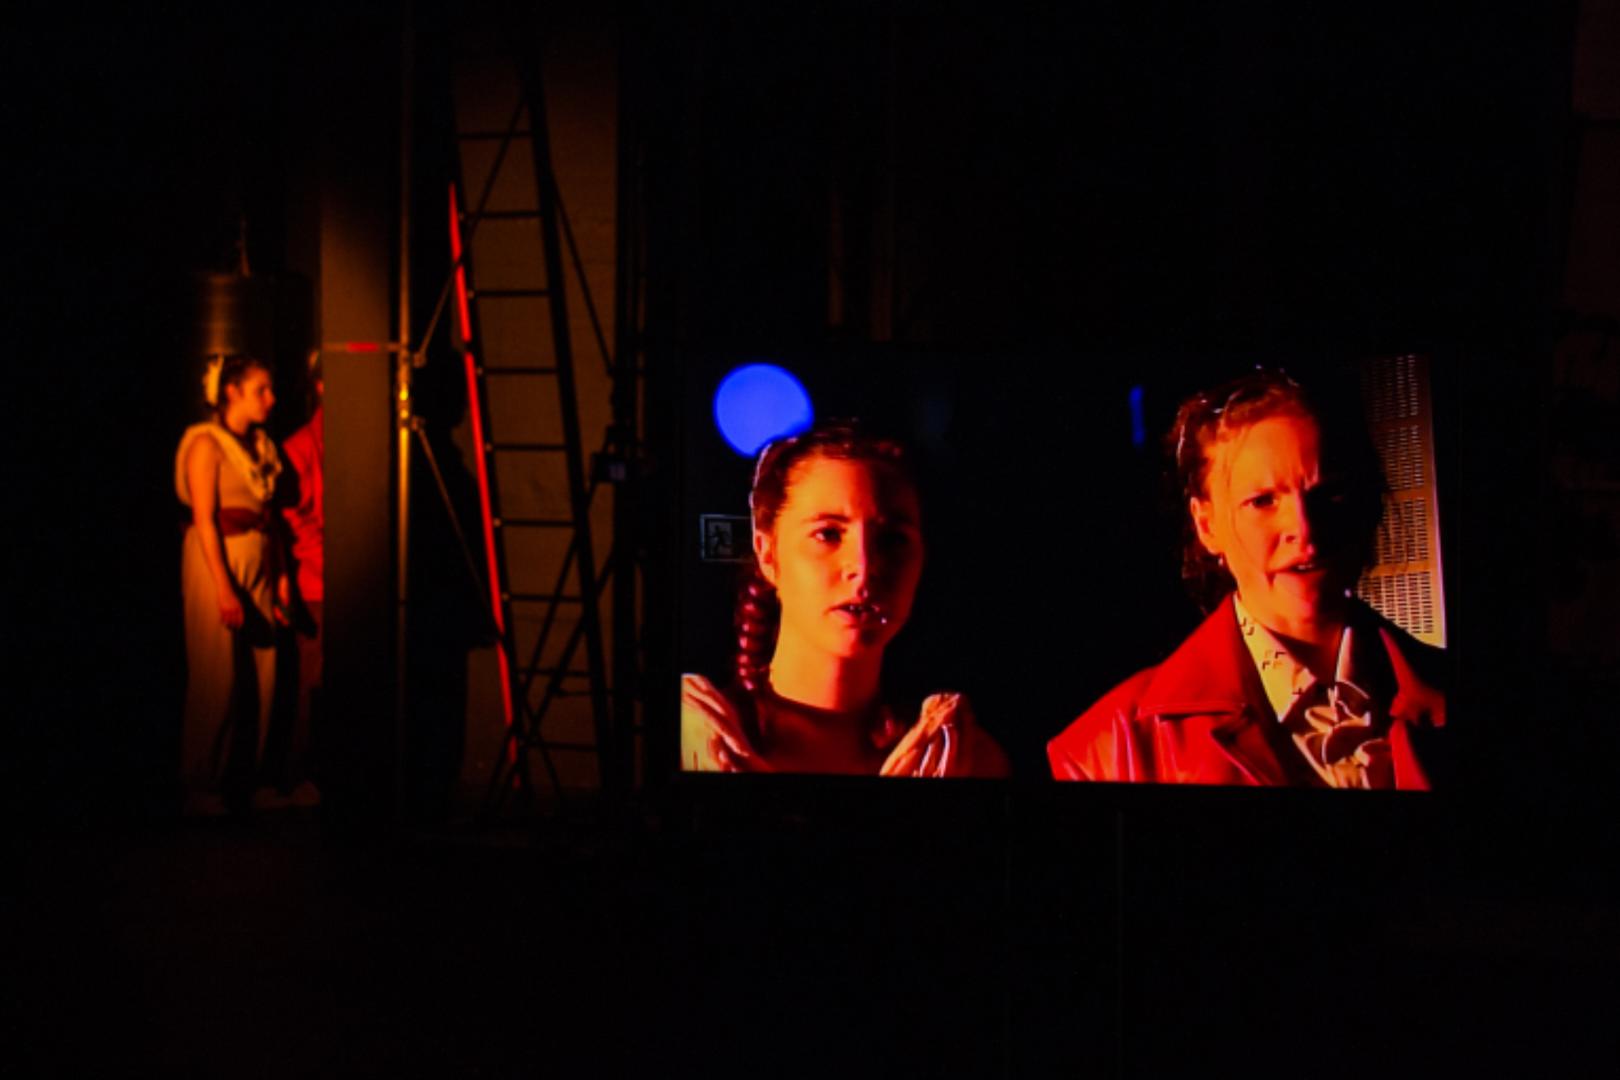 Copyright: Bristol University Theatre Department